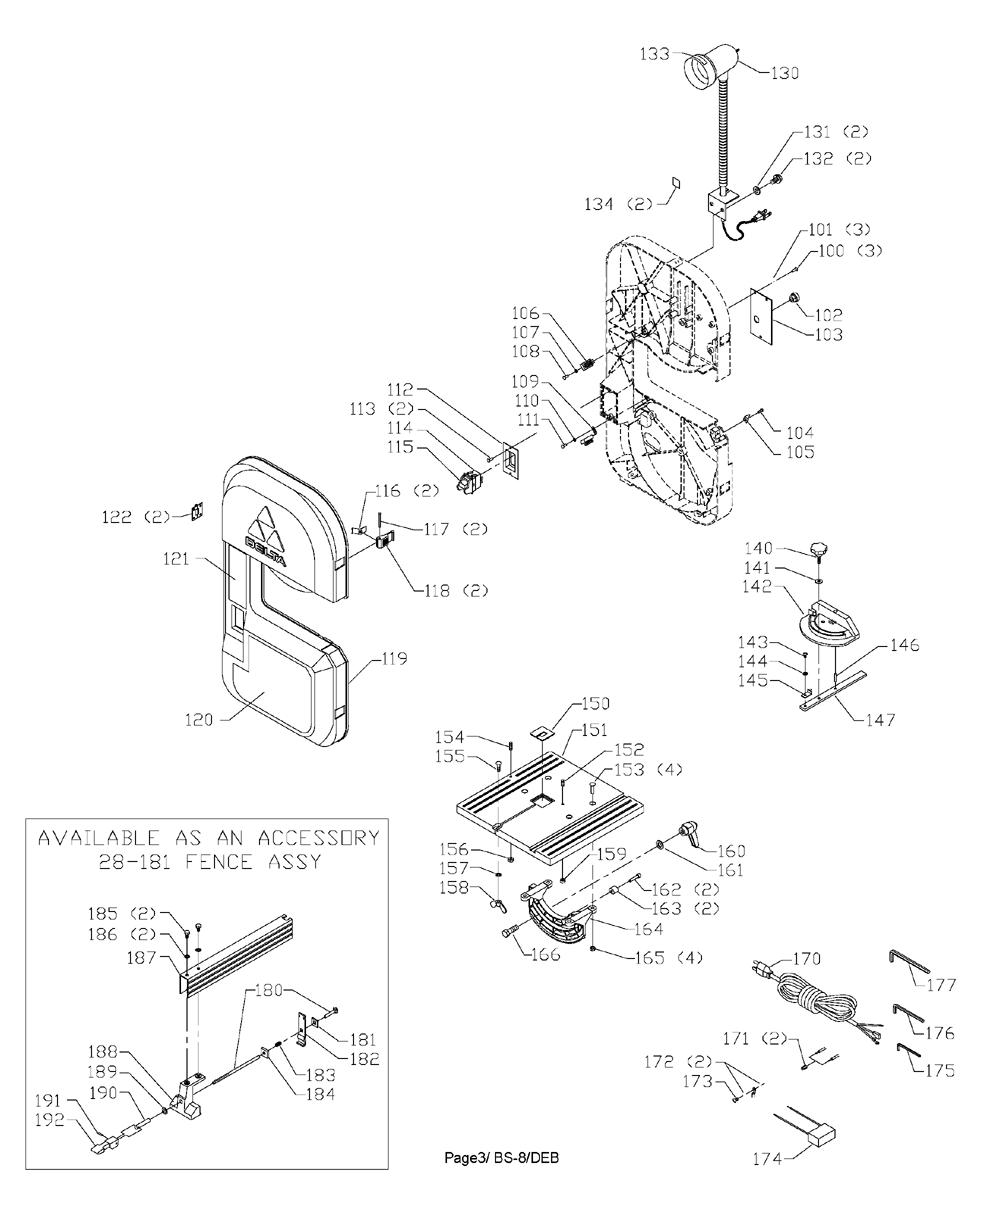 Delta-28-150-Type-1-Parts-3636-PBBreak Down